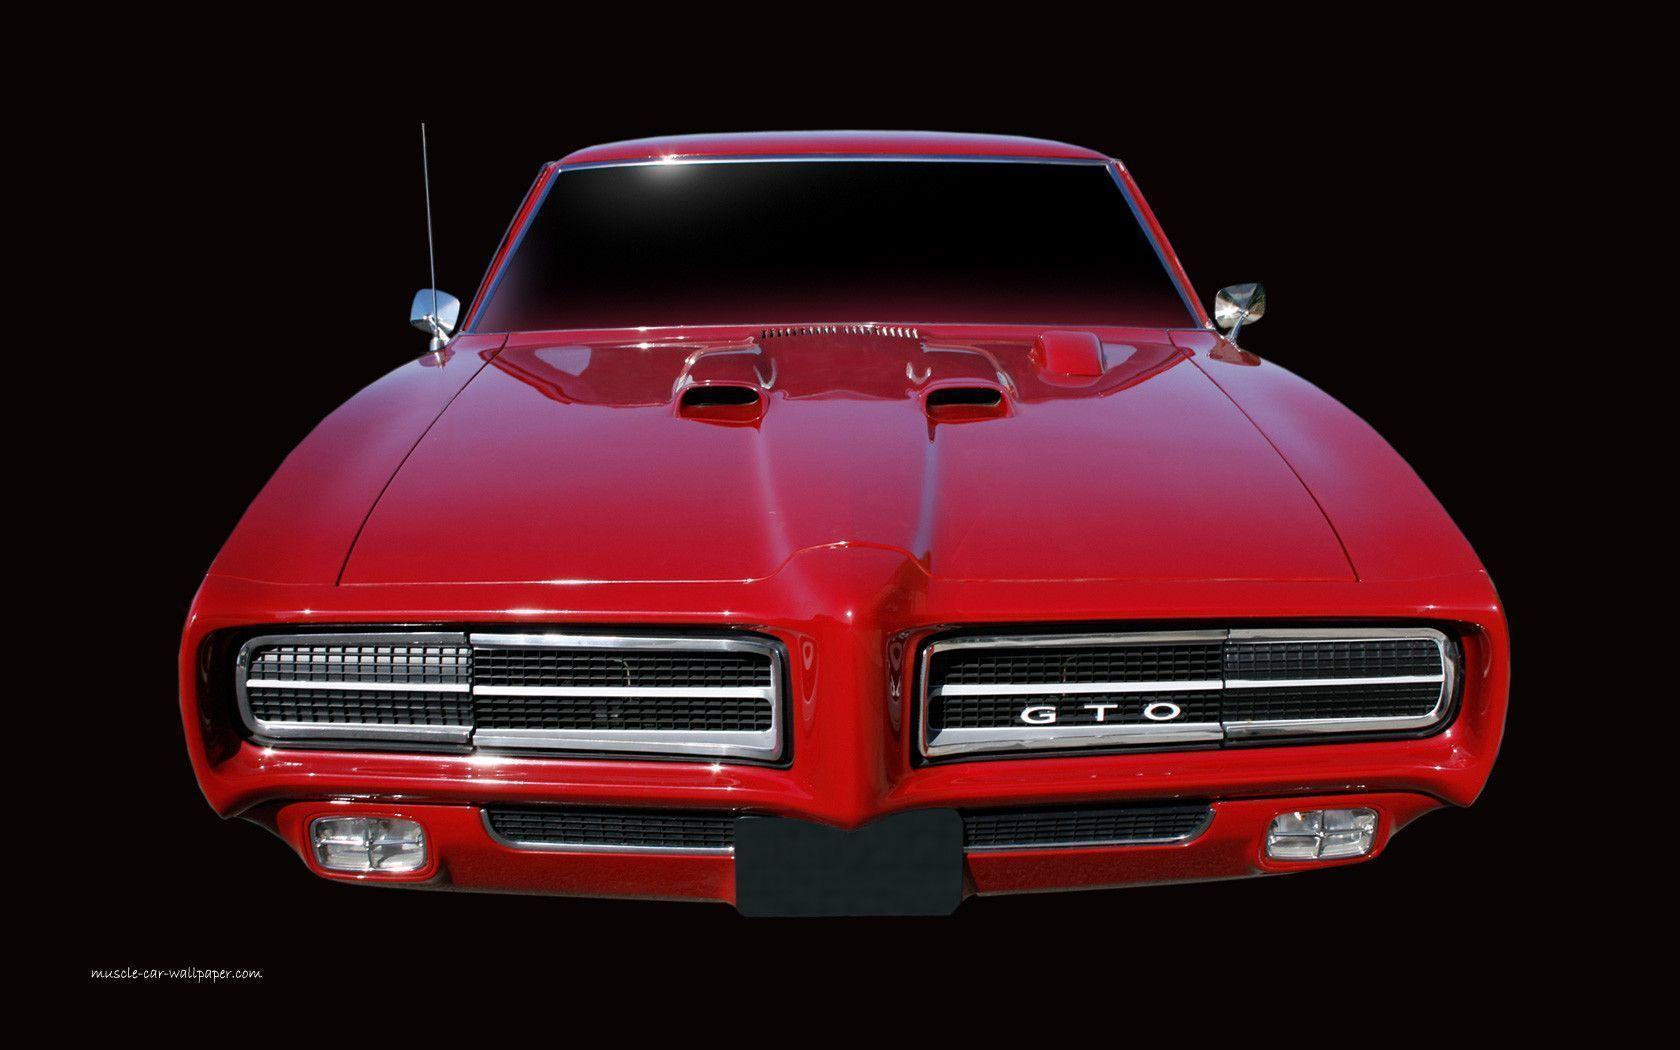 Pontiac GTO Wallpapers 1680x1050